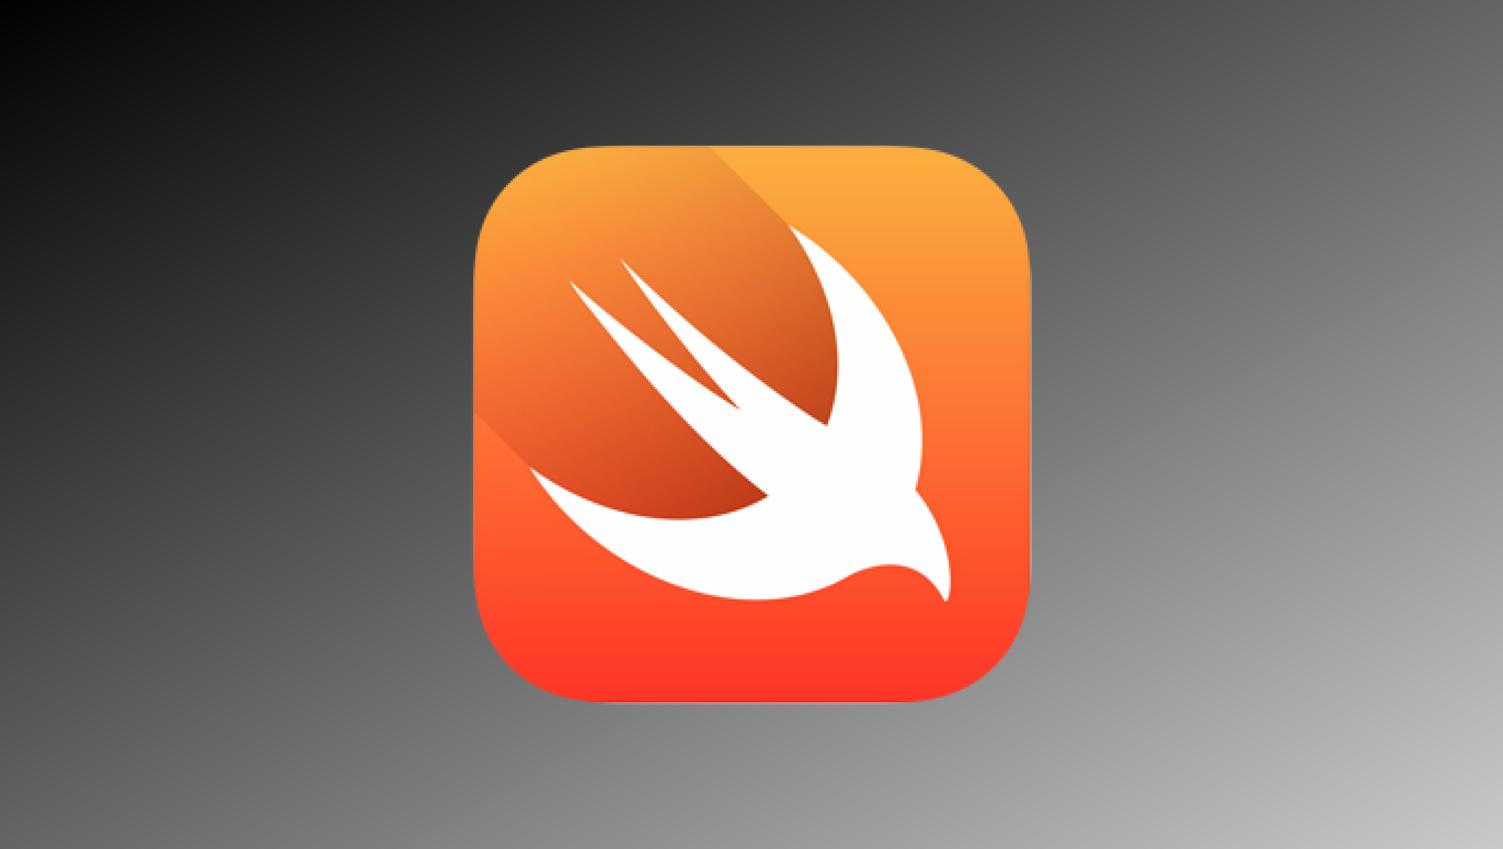 Swift, Apple